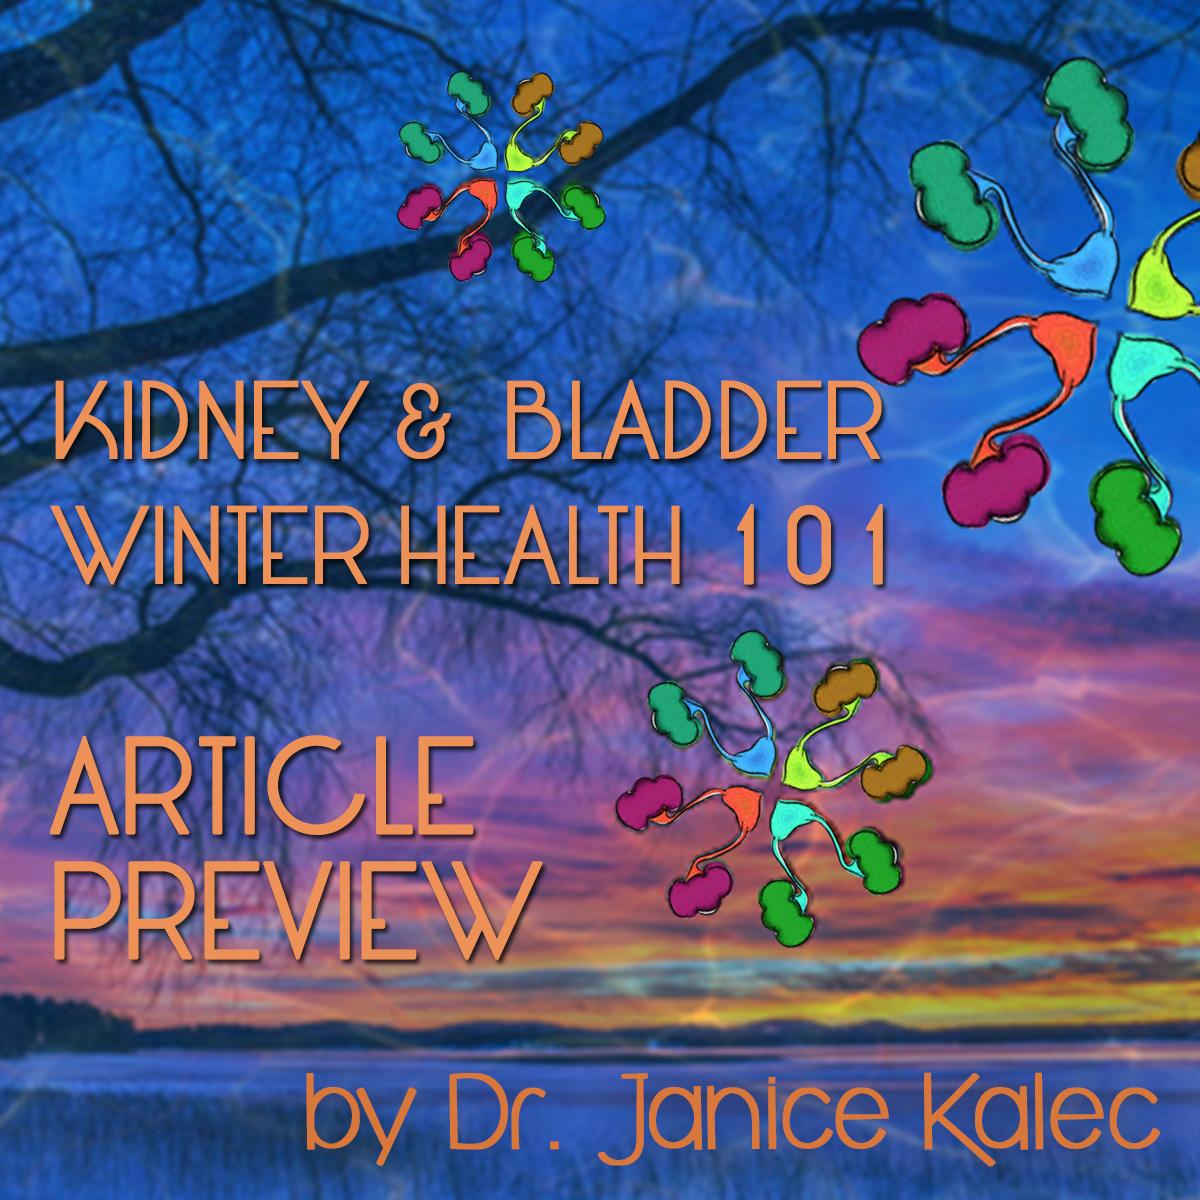 KidneyBladderBOXARTICLE